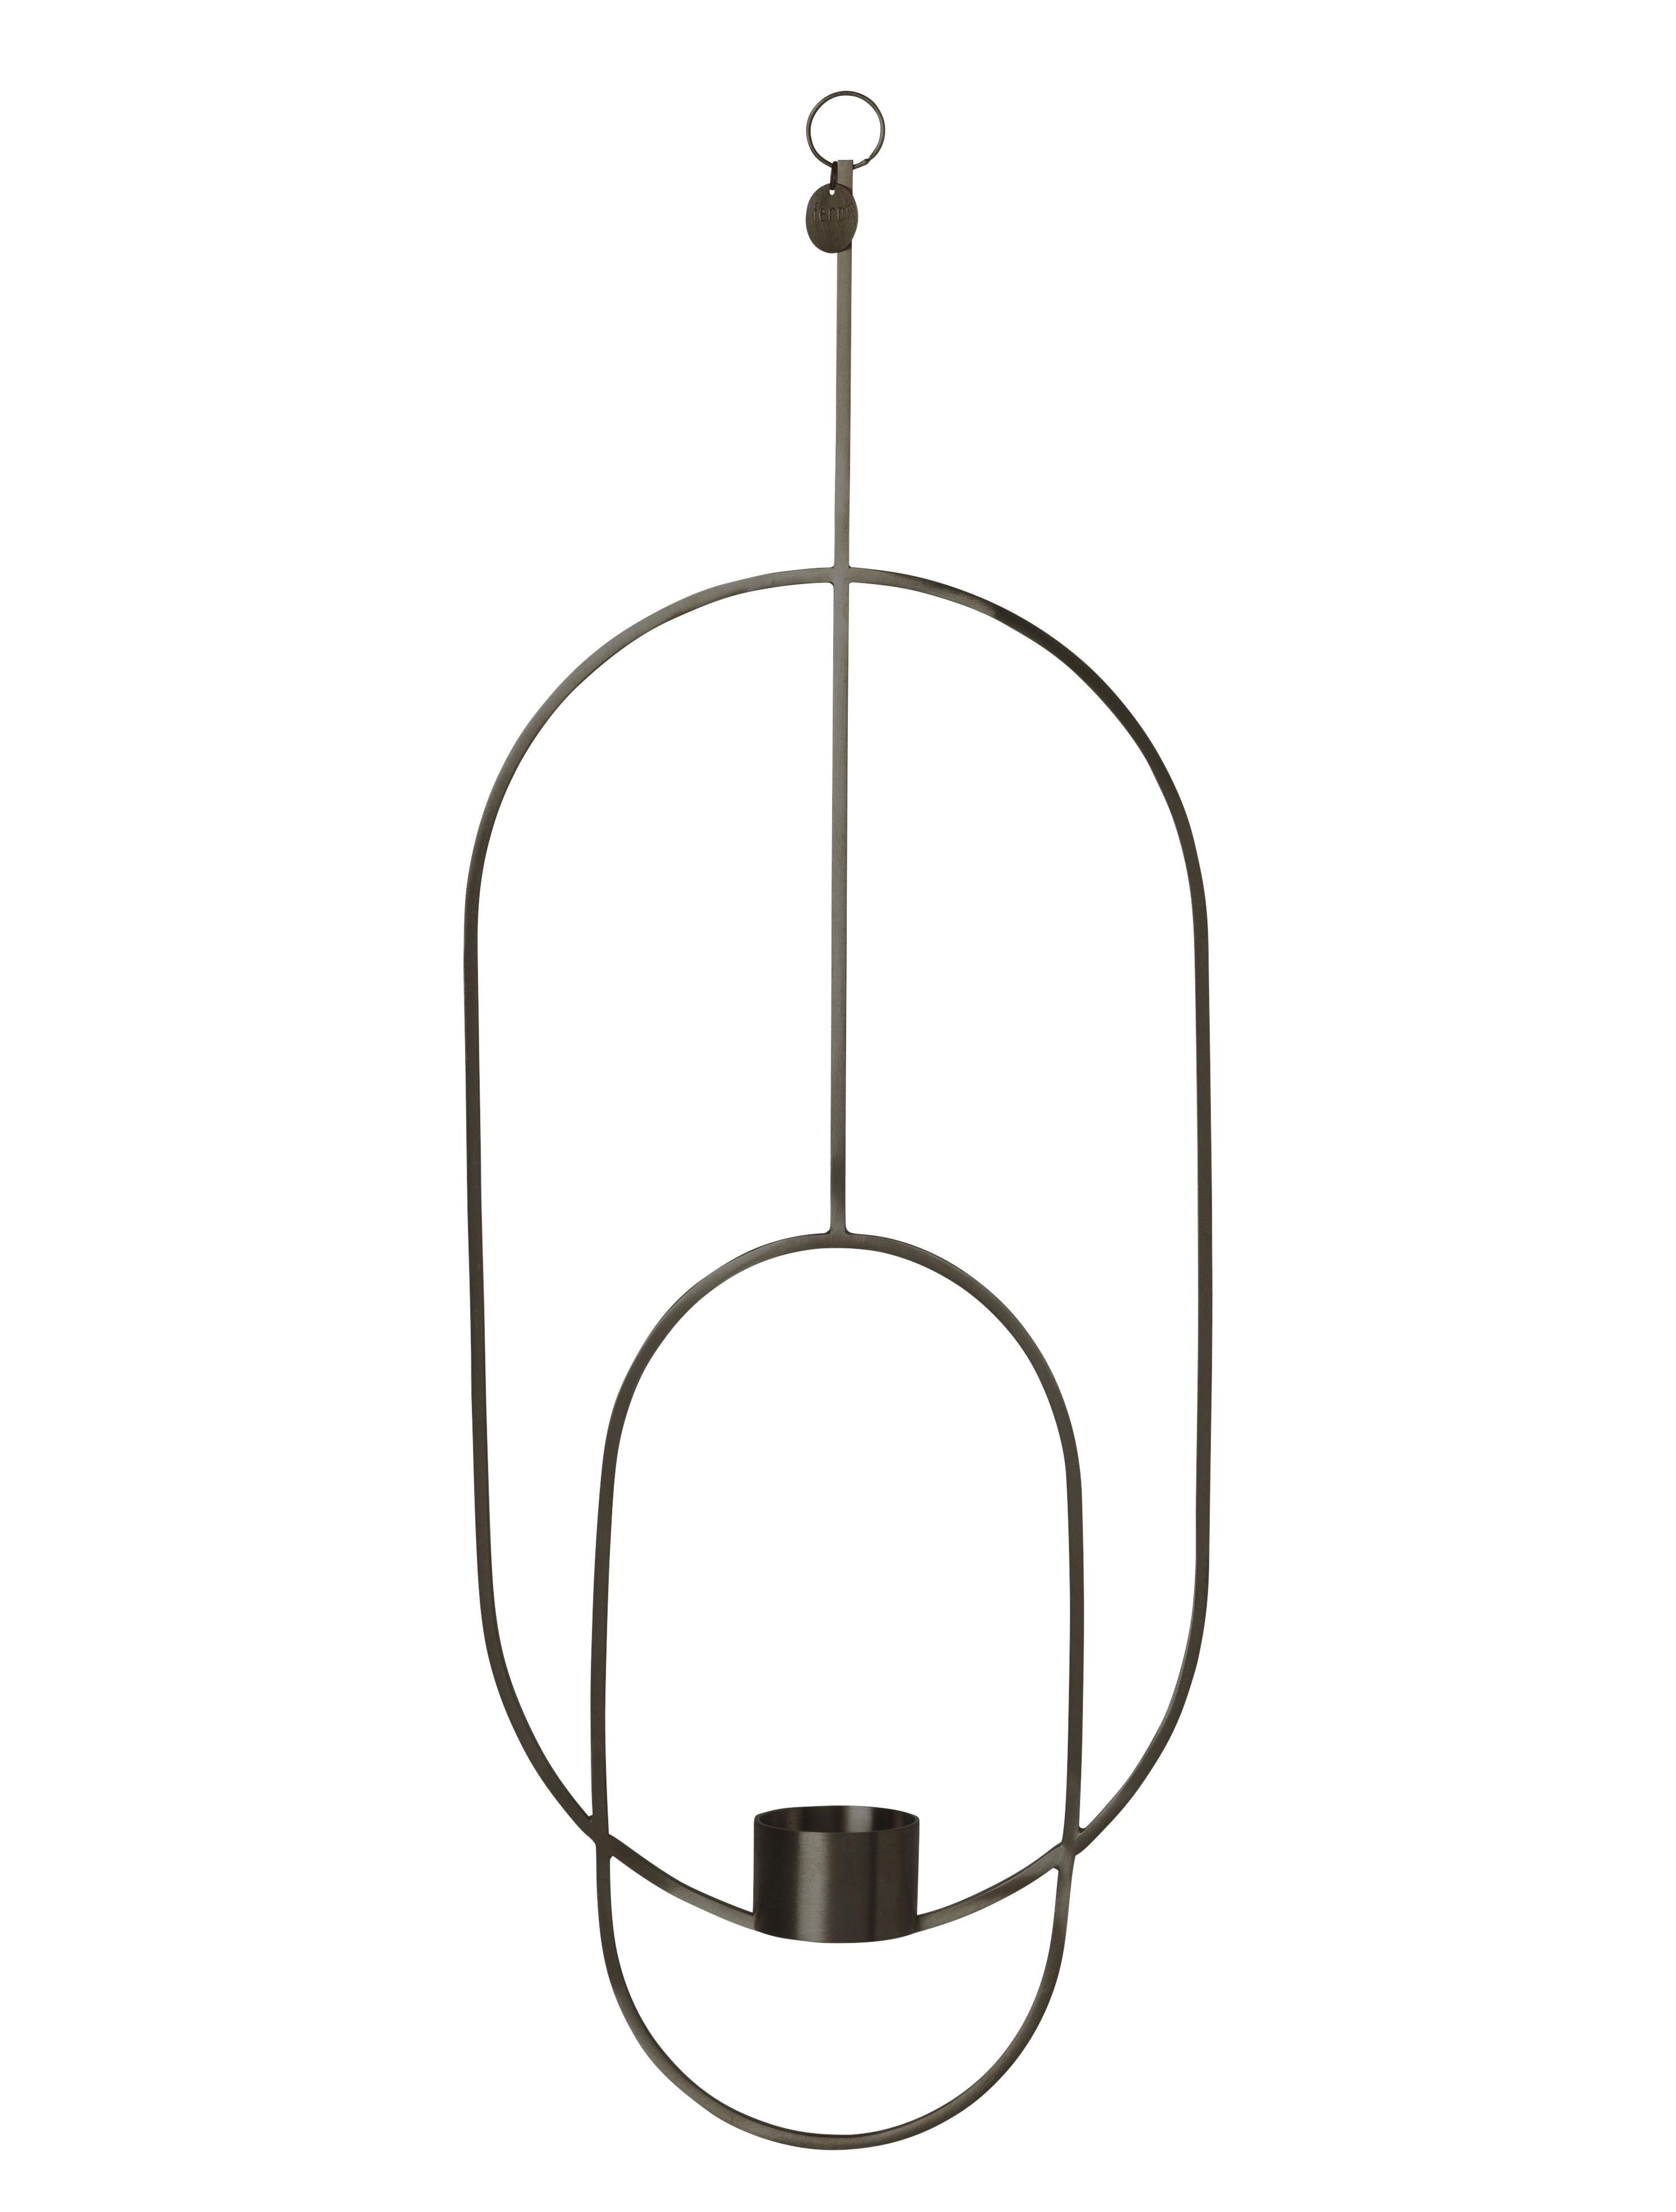 Interni - Candele, Portacandele, Lampade - Portacandela da sospendere Oval - /  L 18 x H 50 cm di Ferm Living - Nero - Laiton peint